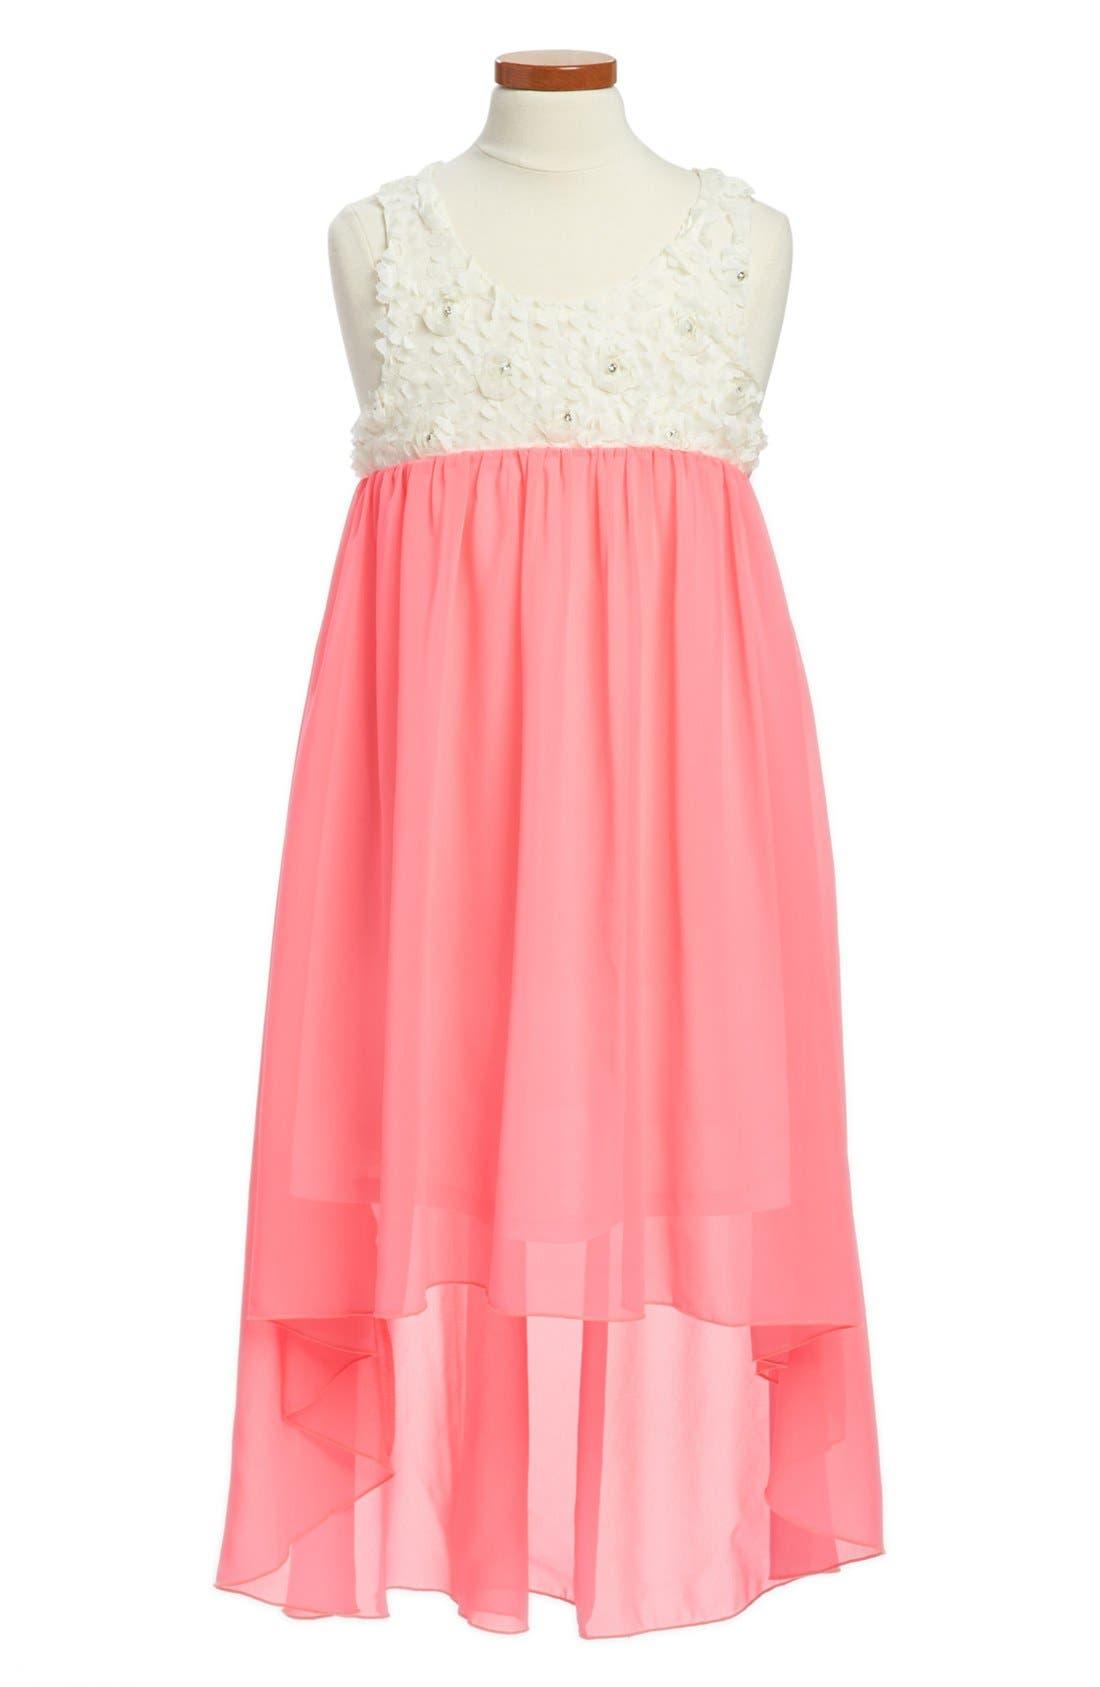 Alternate Image 1 Selected - Truly Me Chiffon Dress (Big Girls)